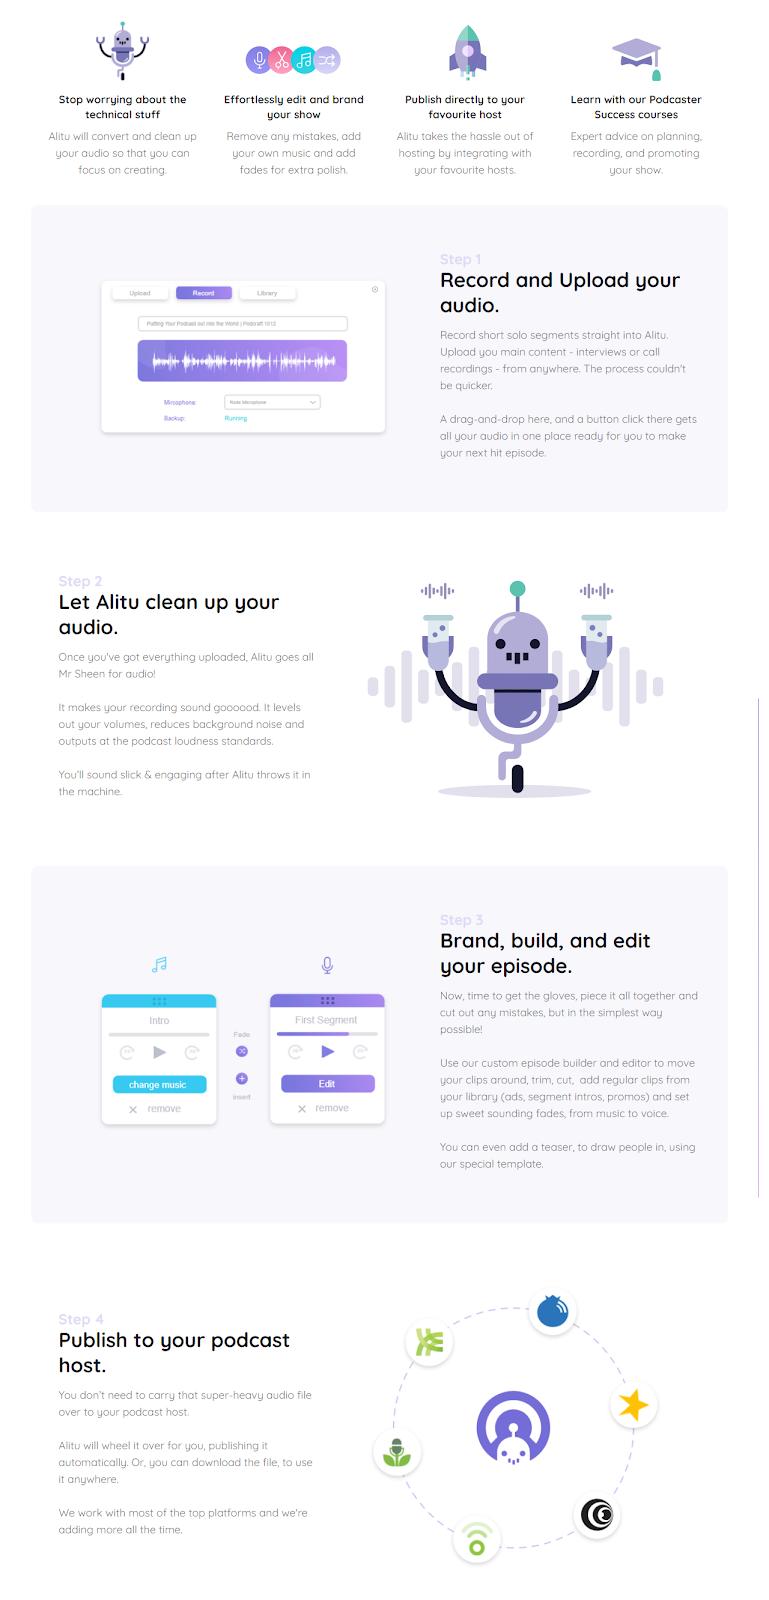 screenshot of Alitu features